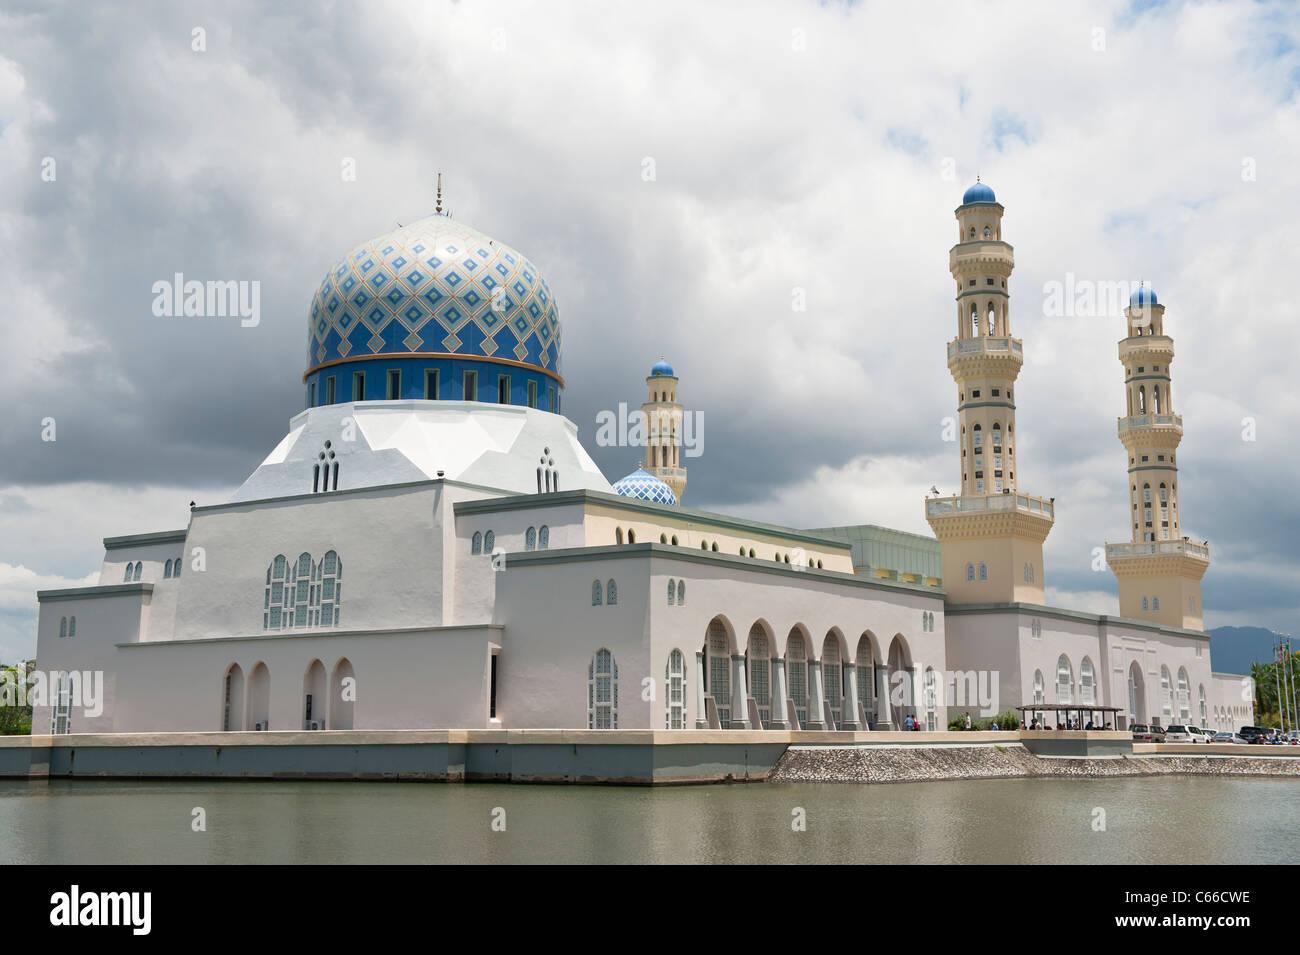 The Kota Kinabalu City Mosque - Stock Image